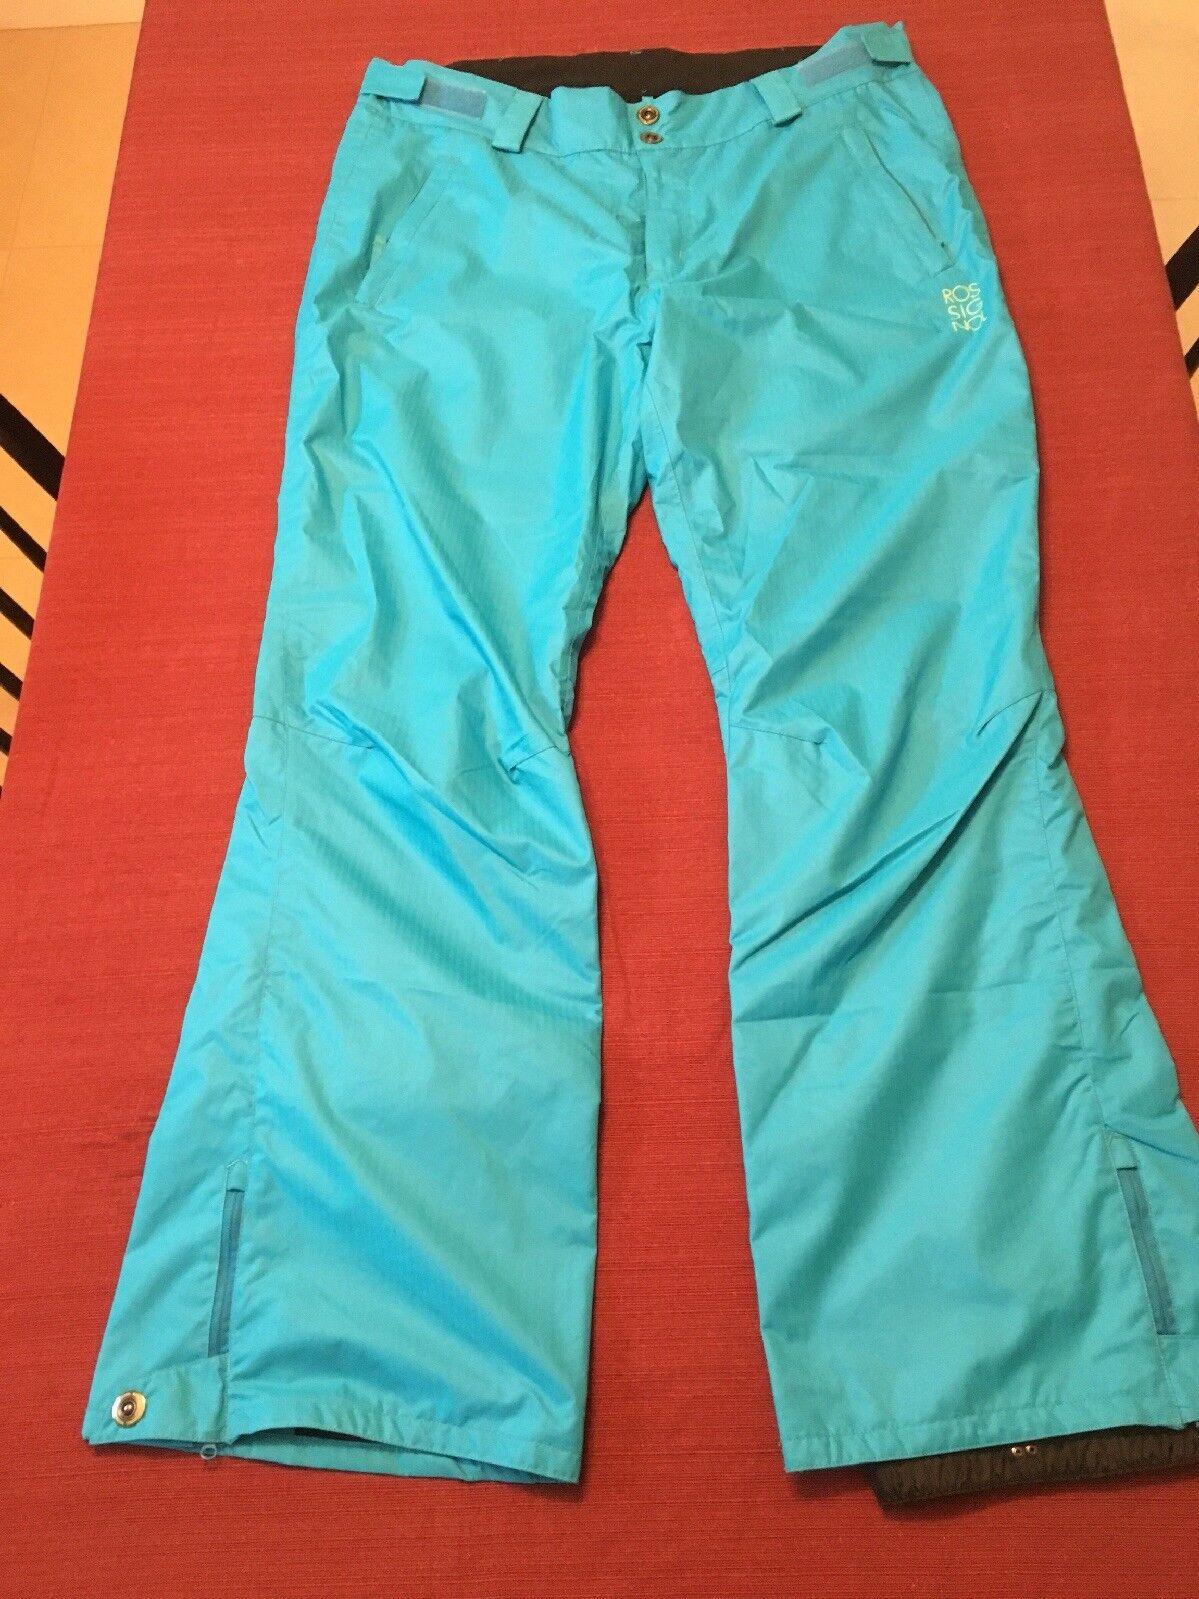 Rossignol, Mens Ski Pants Insulated XL Ocean bluee